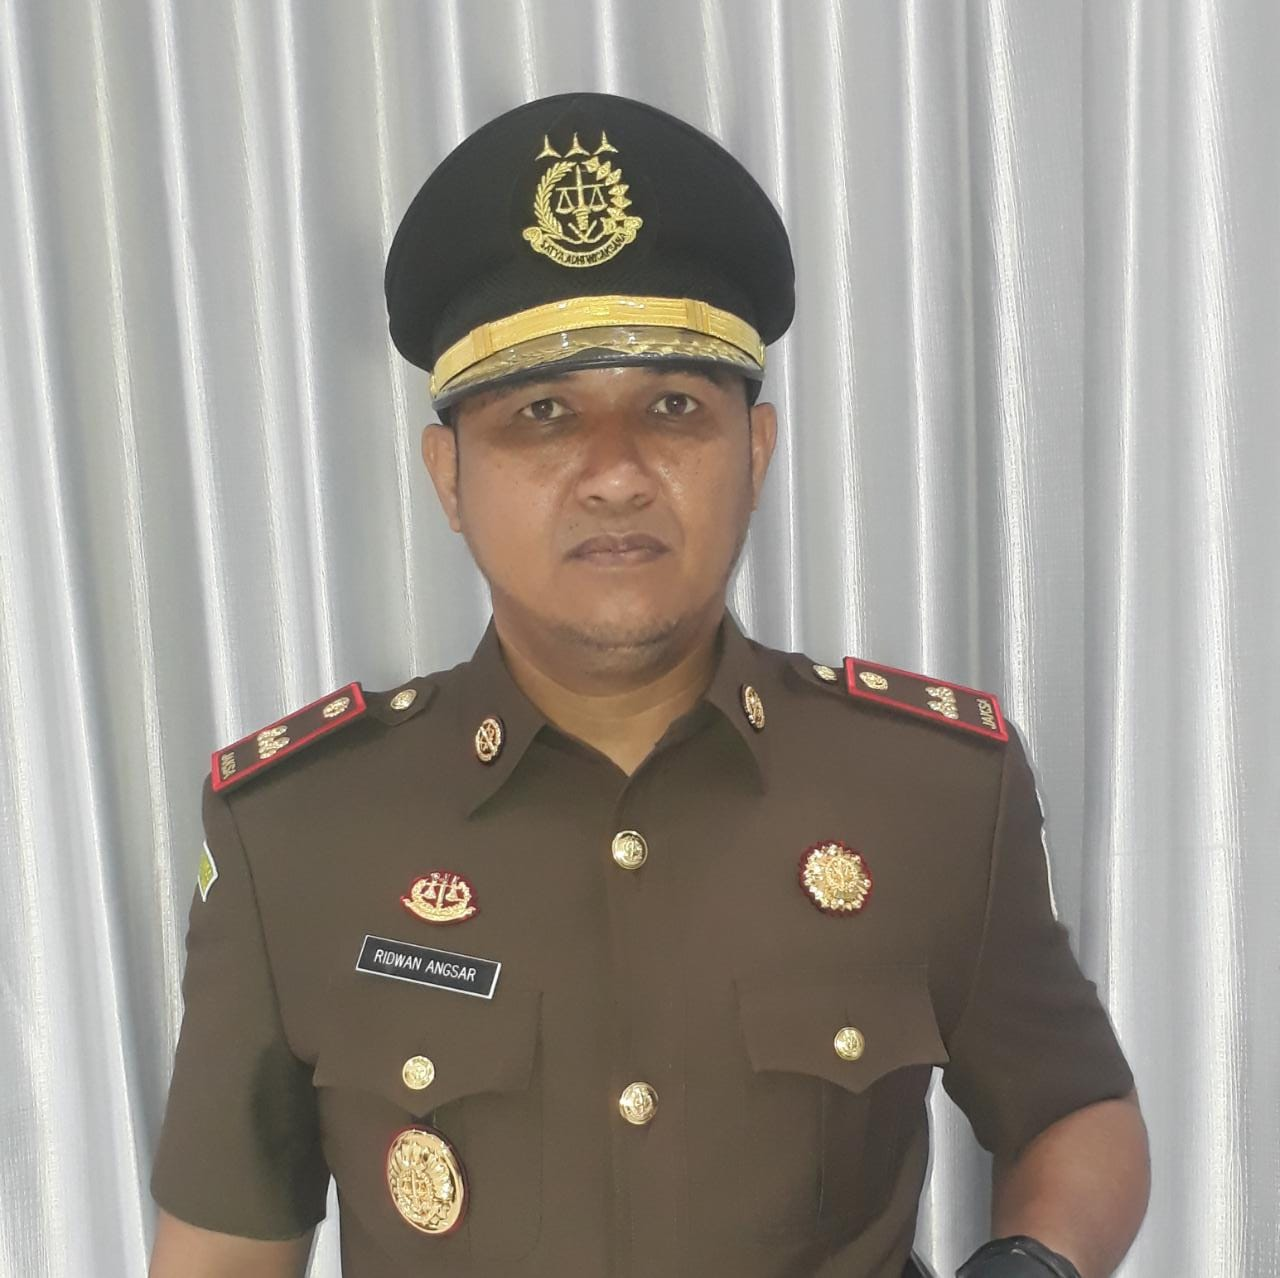 Dugaan Korupsi Pengadaan Kapal Rp 1,4 Miliar Naik Penyidikan, Kejari Lembata Katongi Calon Tersangka